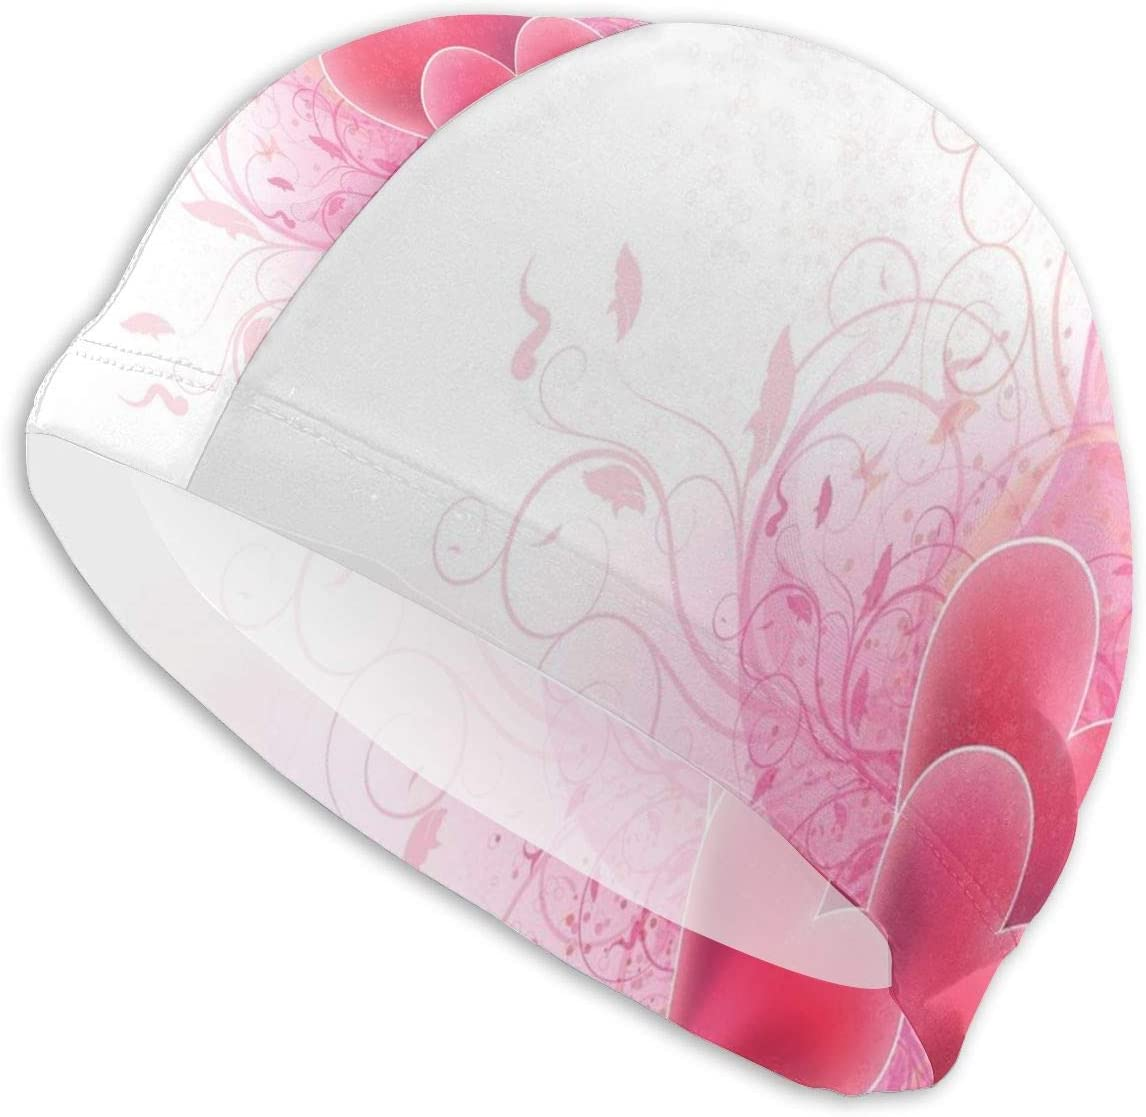 Gebrb Gorro de Baño/Gorro de Natacion, Elastic Swimming Hat Diving Caps,Love Valentines Day Themed Hearts Floral Arrangement Romantic Amour Illustration,For Men Women Youths